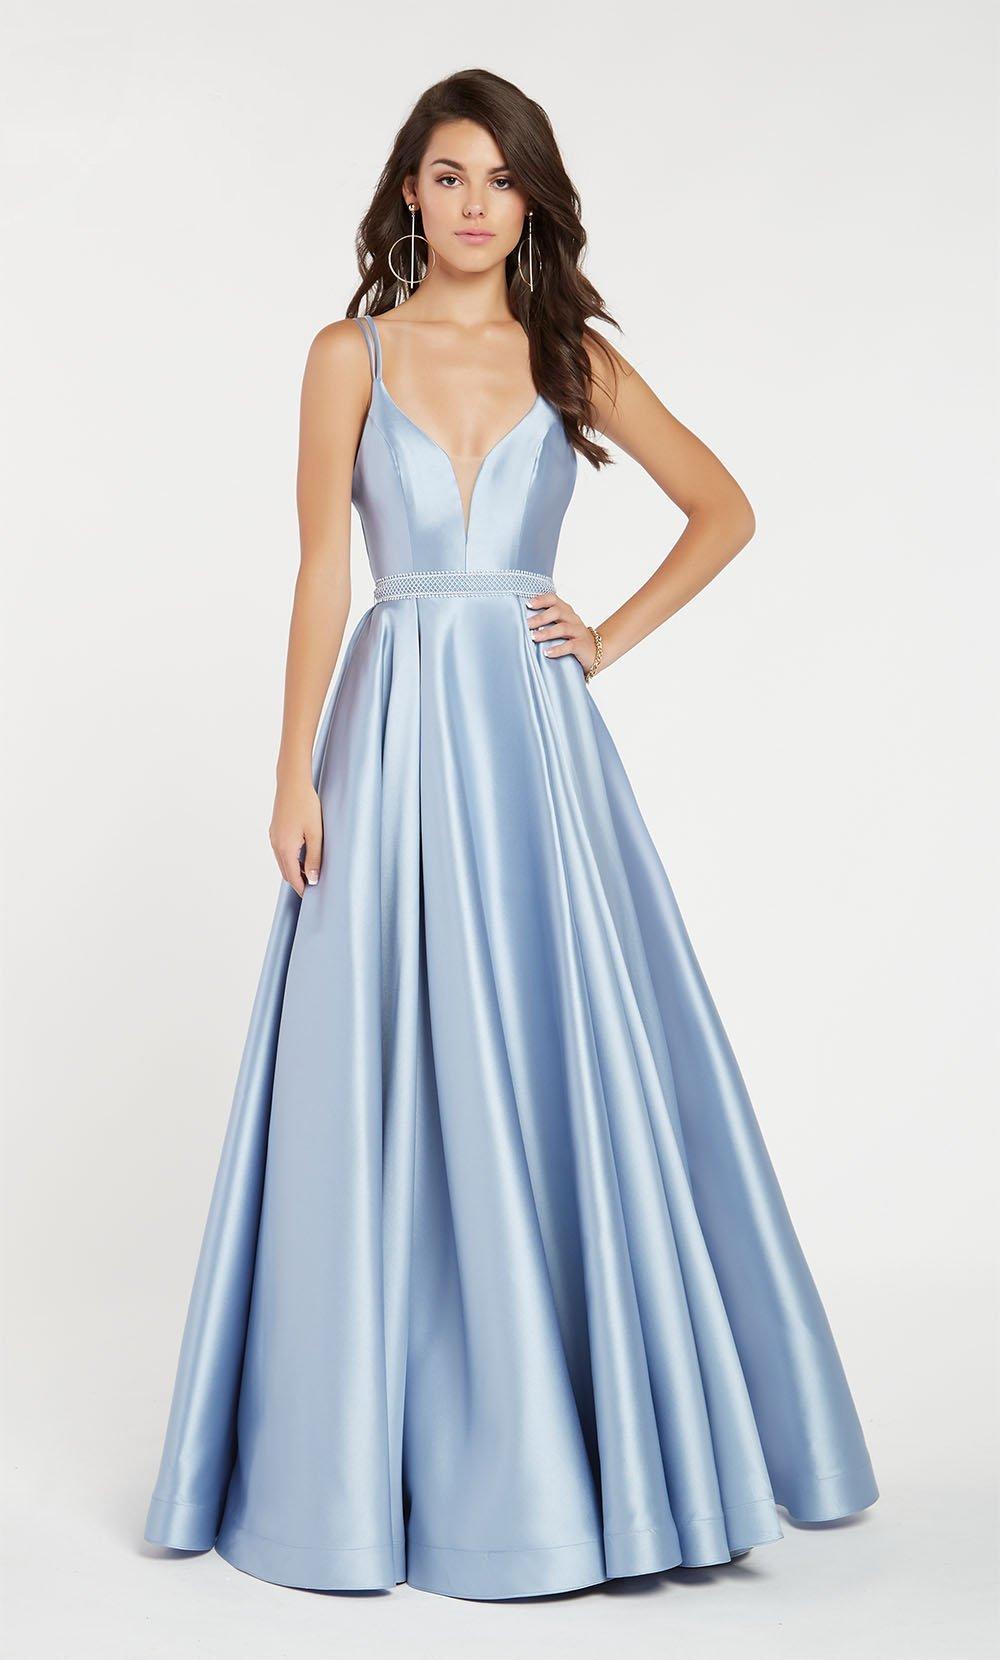 Alyce Paris - 60345 Sleeveless Low V Neck Illusion Mikado A-Line Gown